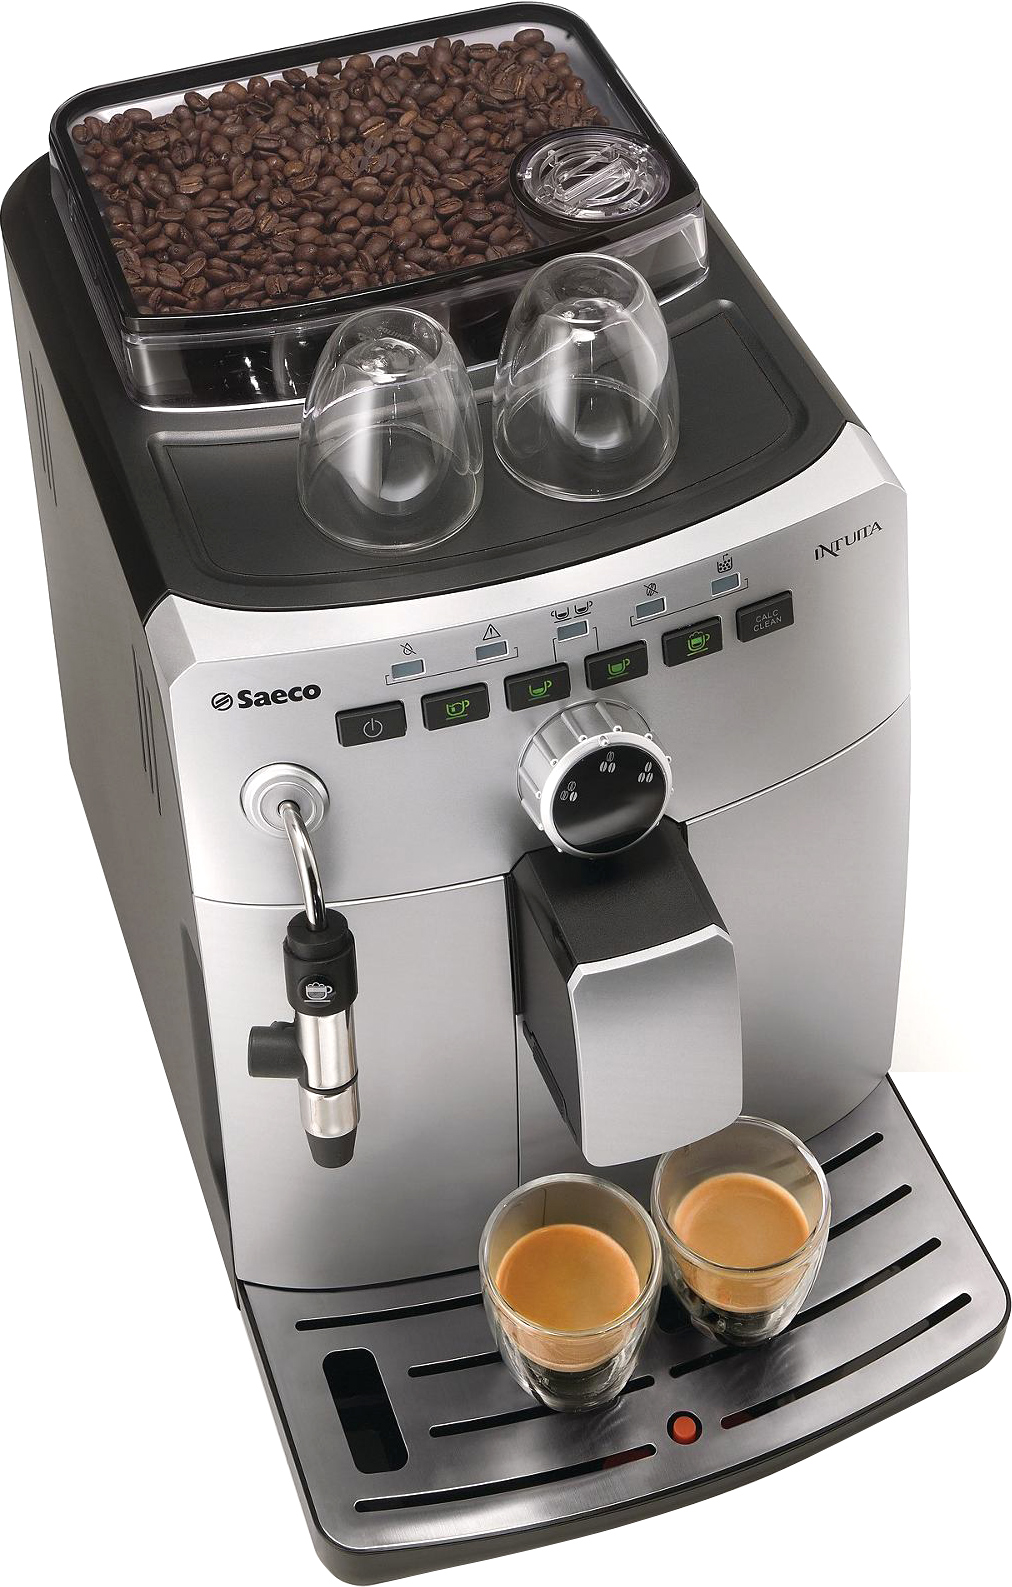 INTUITA cappuccino (HD8750/99) (Silver) 21vek.by 6063000.000